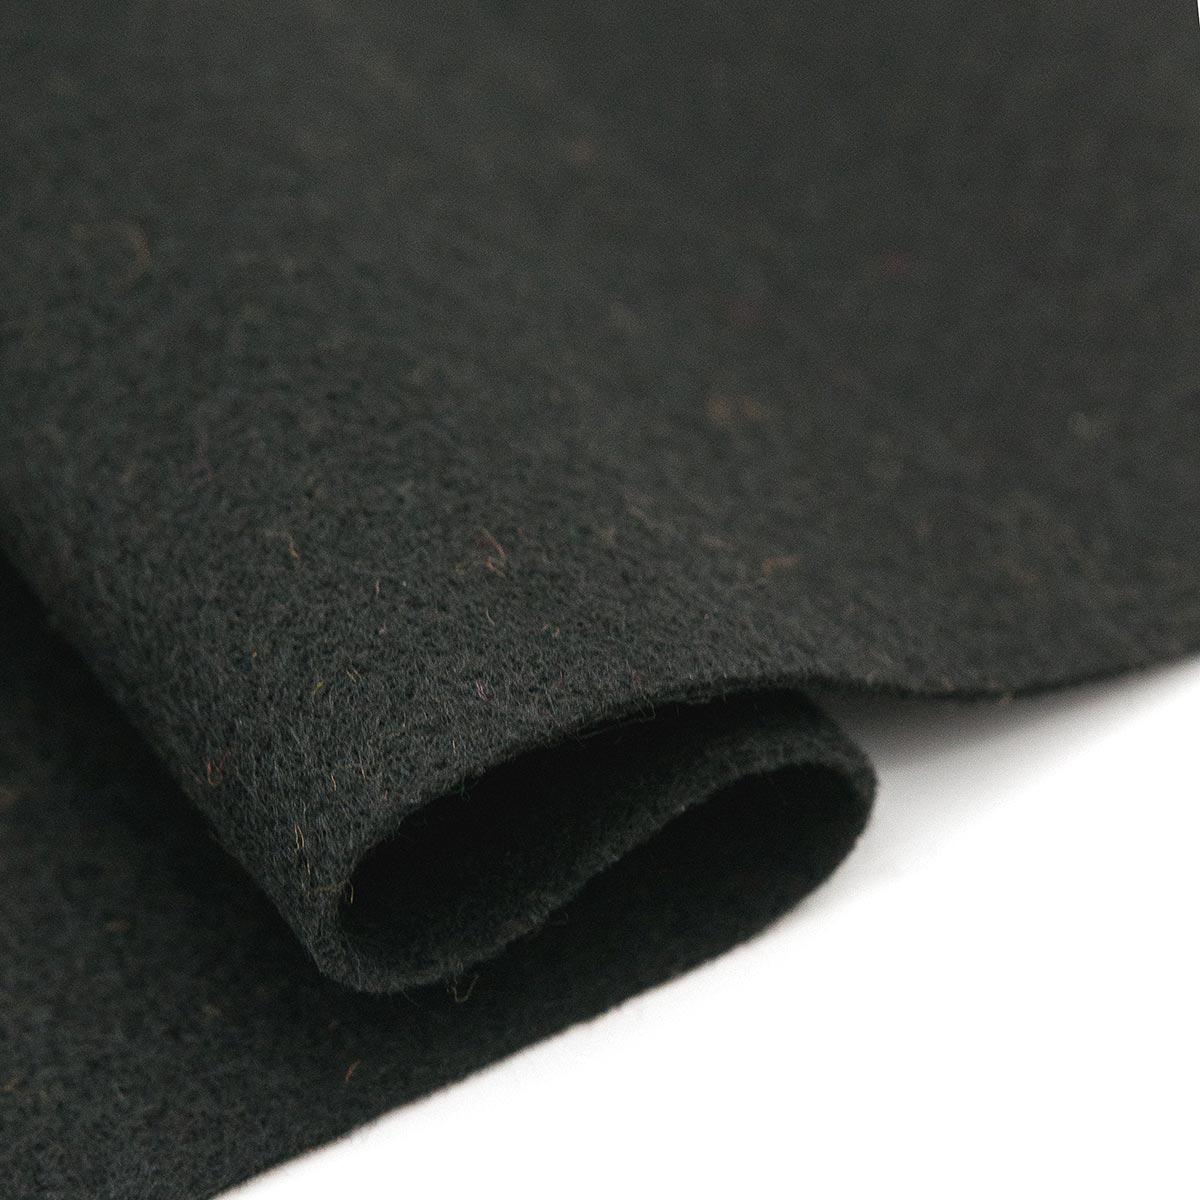 61212680 Фетр для творчества, черный, 2мм, 20x30см, уп./1шт. Glorex